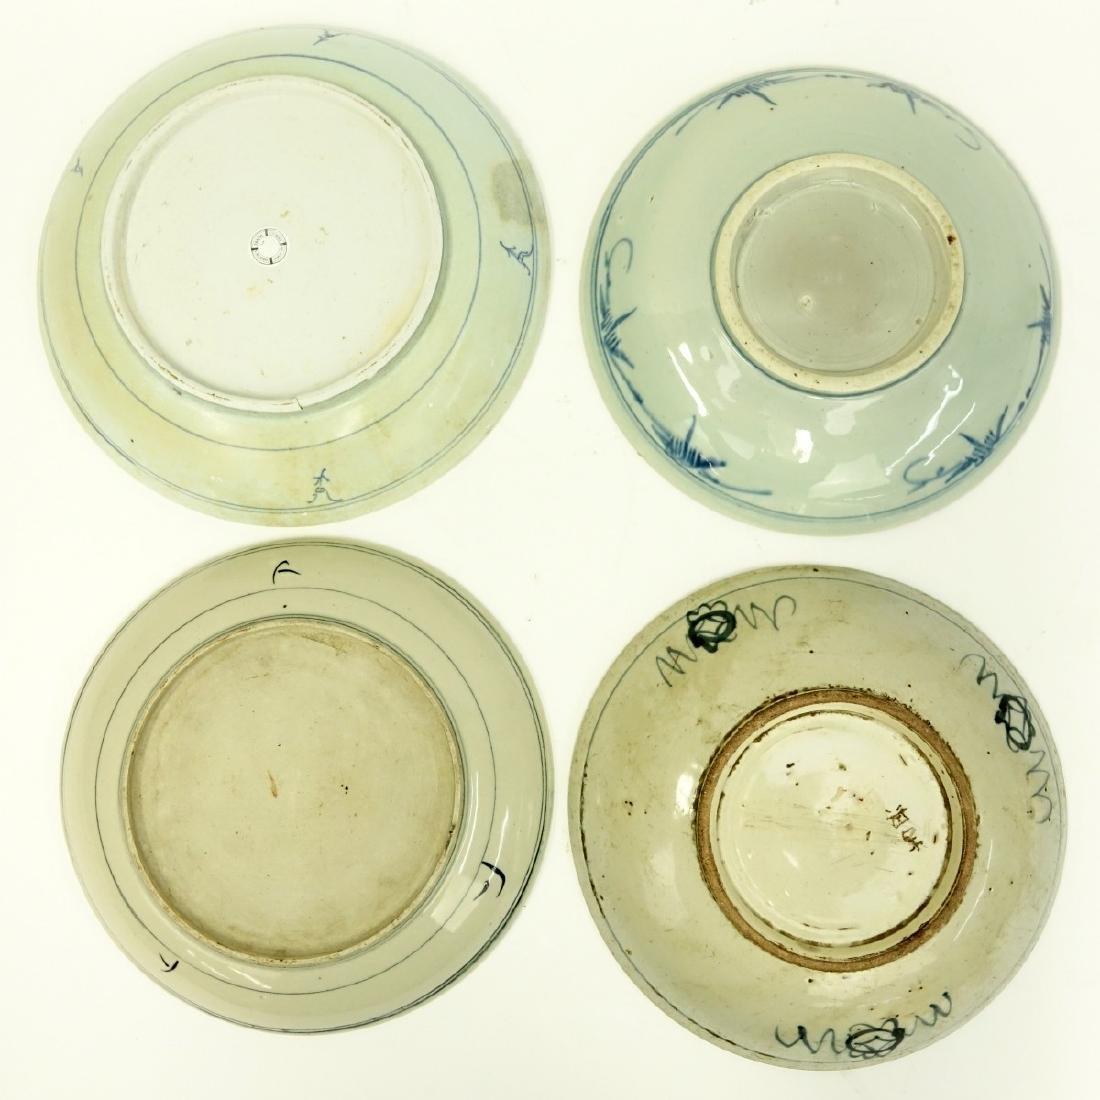 4 Antique Chinese Blue & White Ceramic Bowls - 2